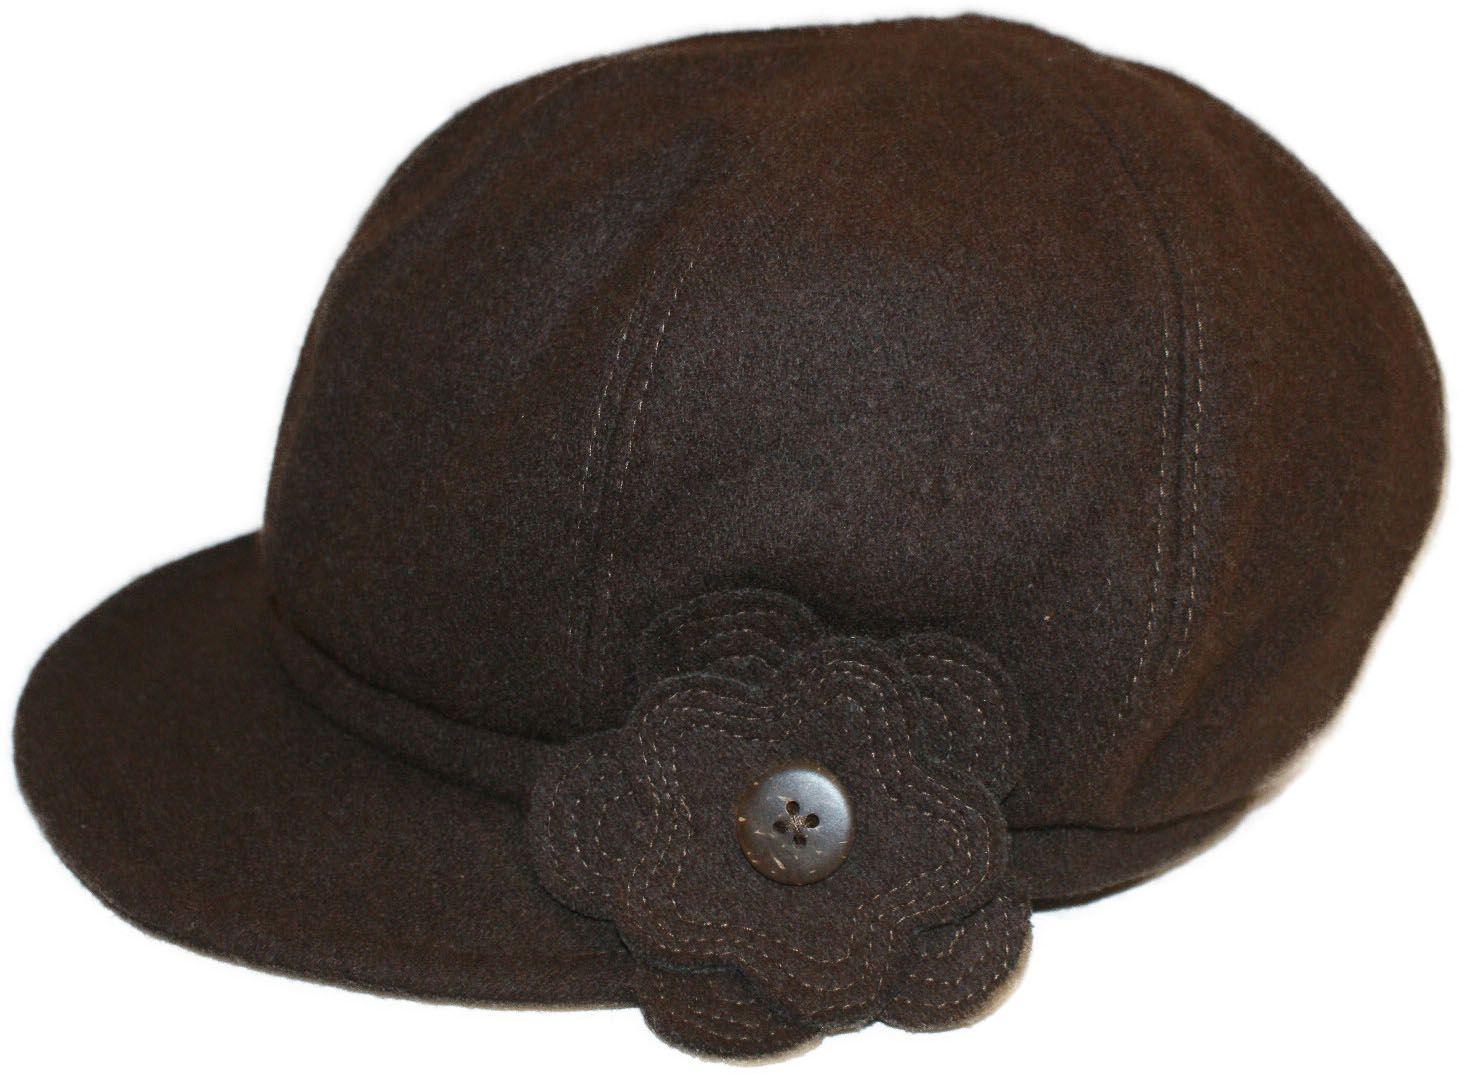 eae19101br_chapeau-casquette-pin-up-40-s-50-s-retro-gaby-brun